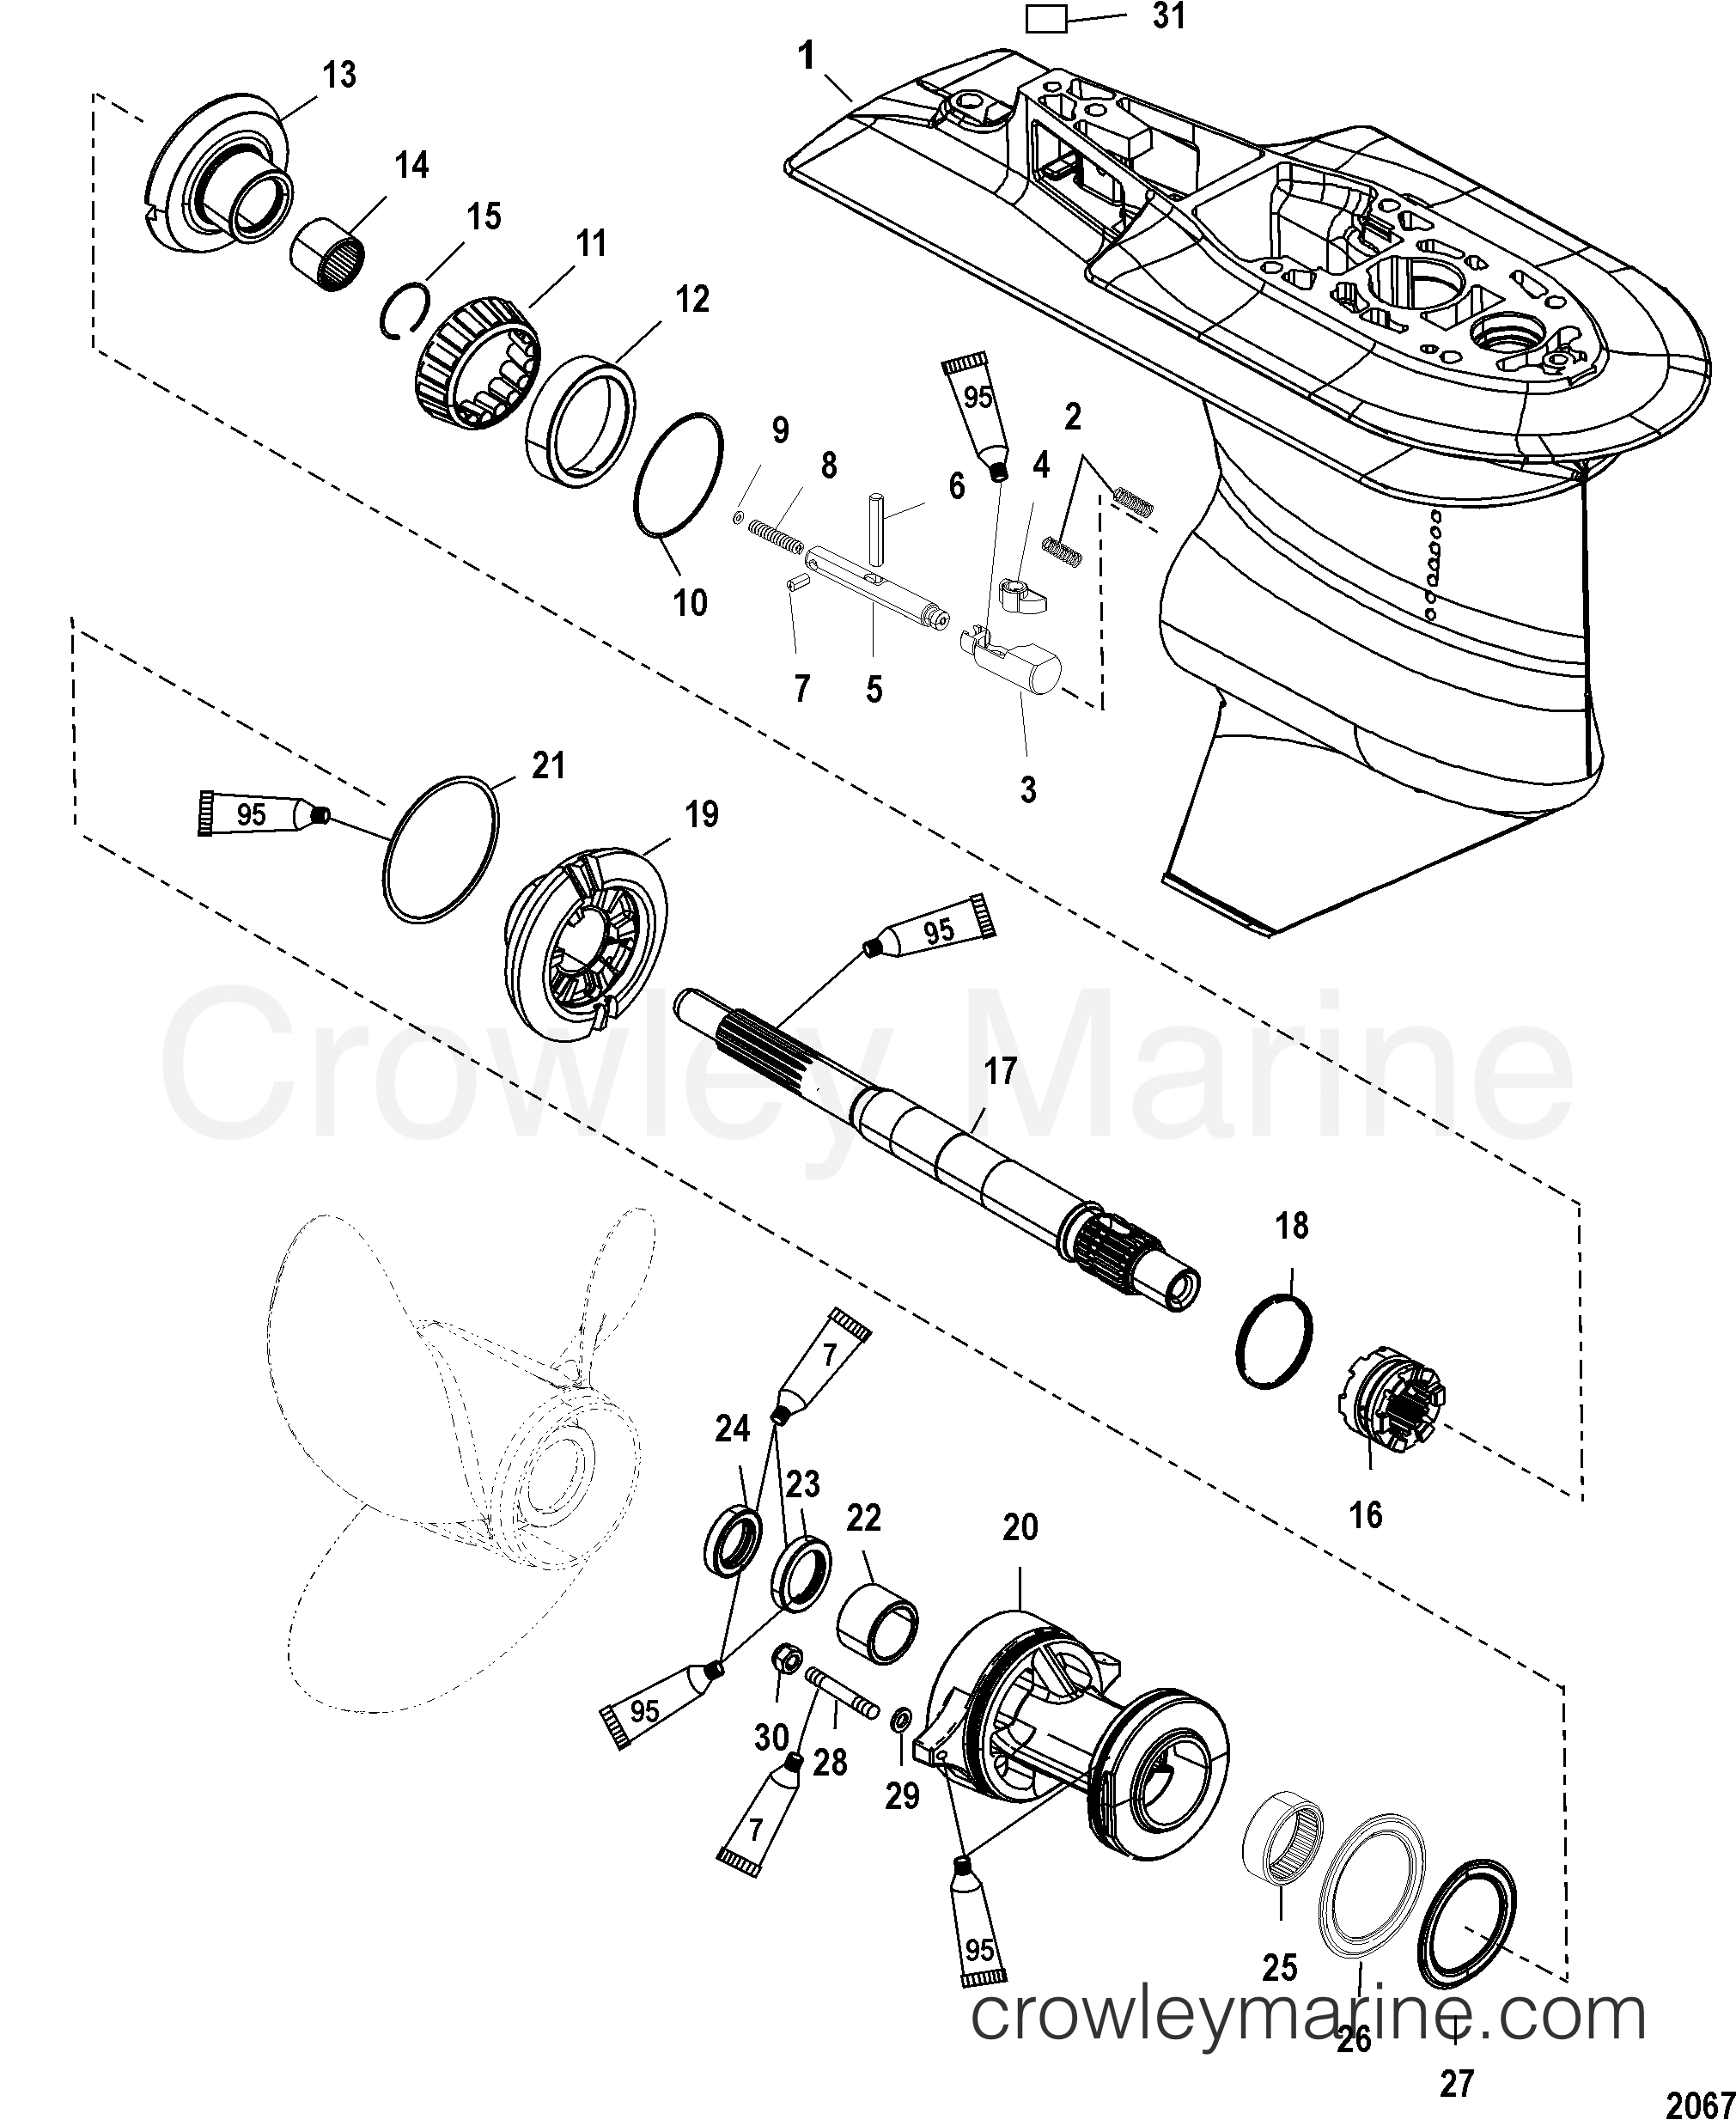 2006 Mercury Outboard 40EFI [ELPT 4] - 1E41412FB - GEAR HOUSING(PROP SHAFT-2.33:1)(SERIAL #1C033811 & UP) section